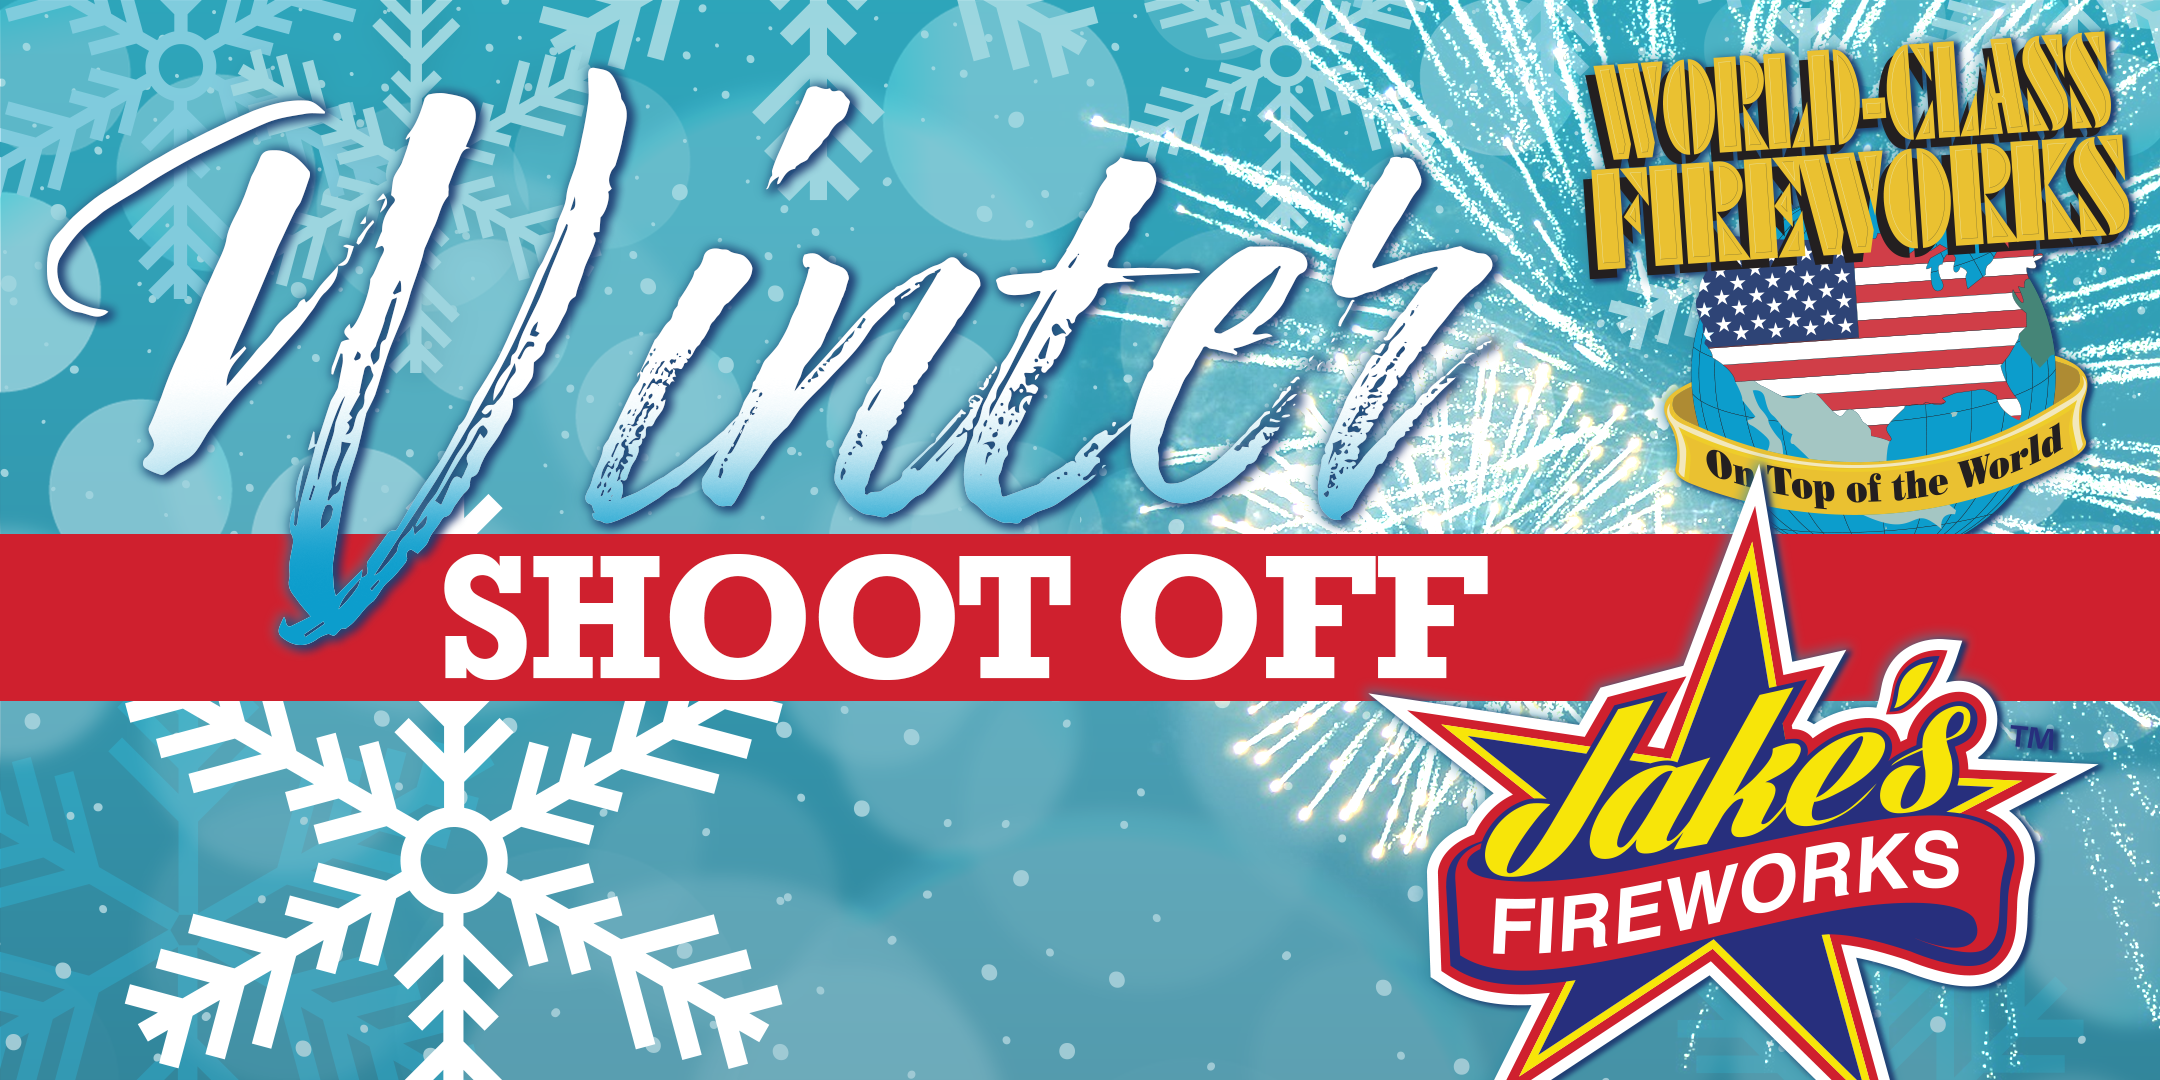 Winter Shoot Off Set for November 16th